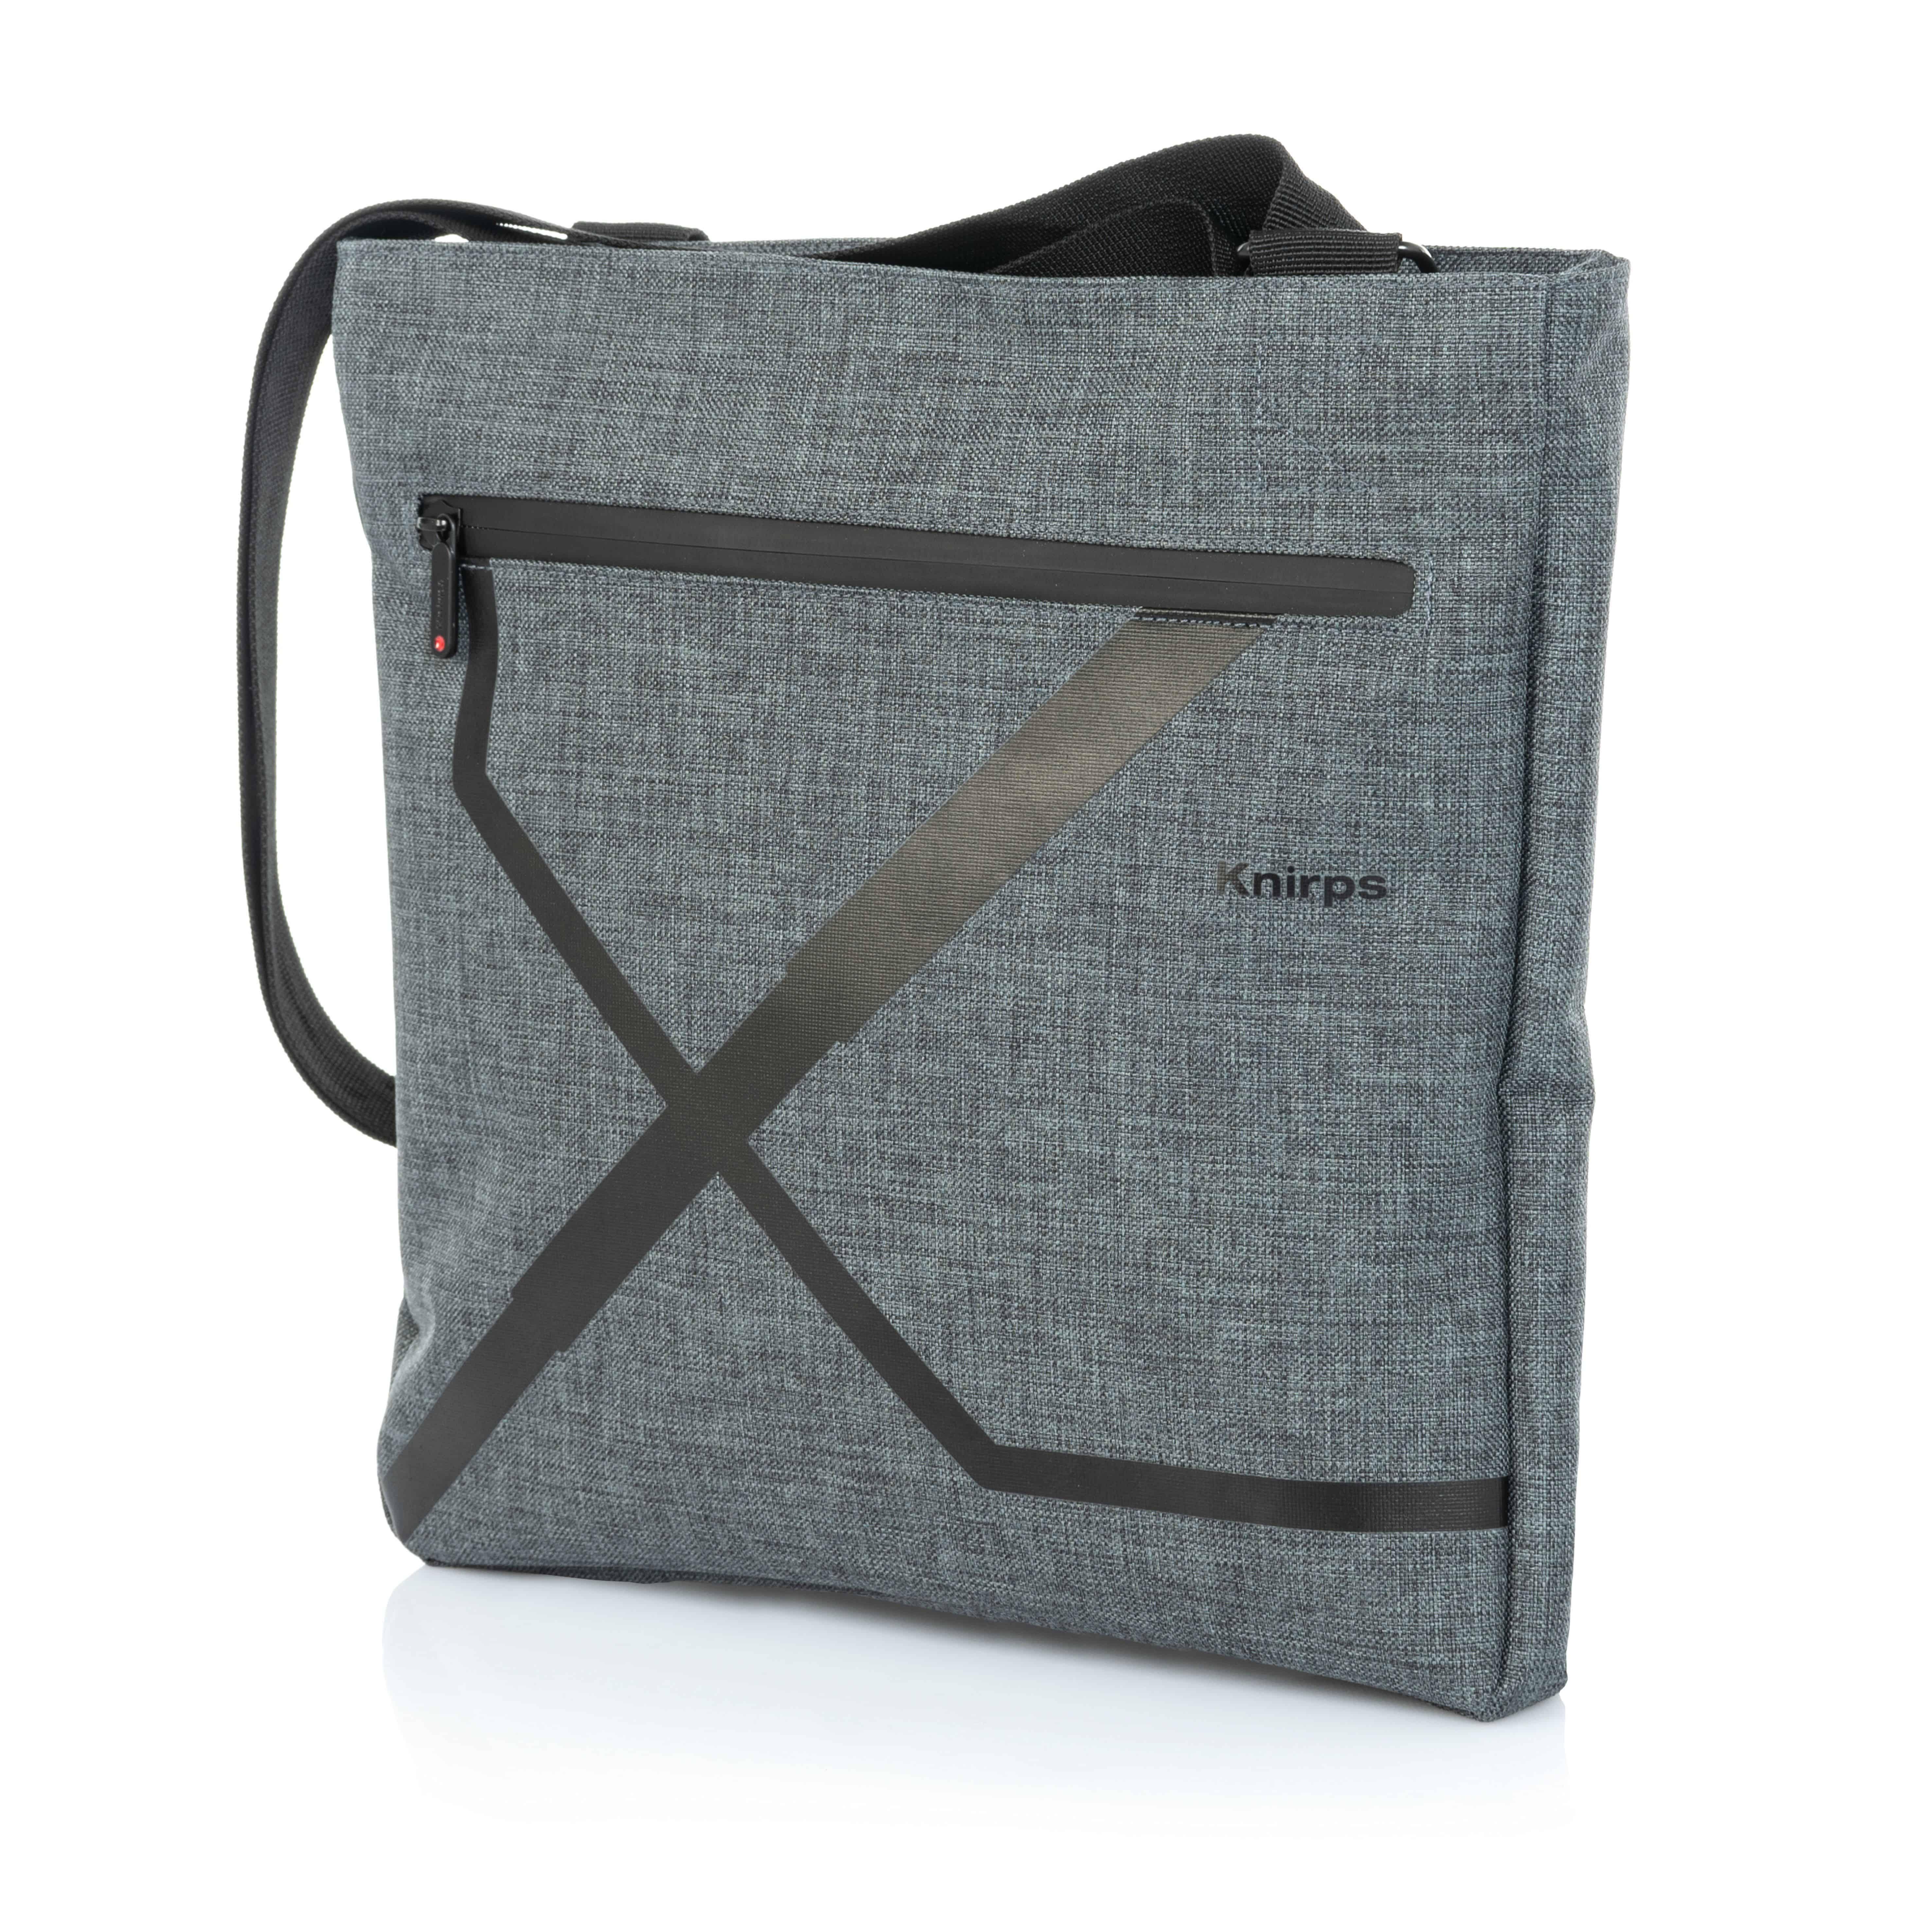 Knirps Rainwear Accessoires Knirps Crossover bag